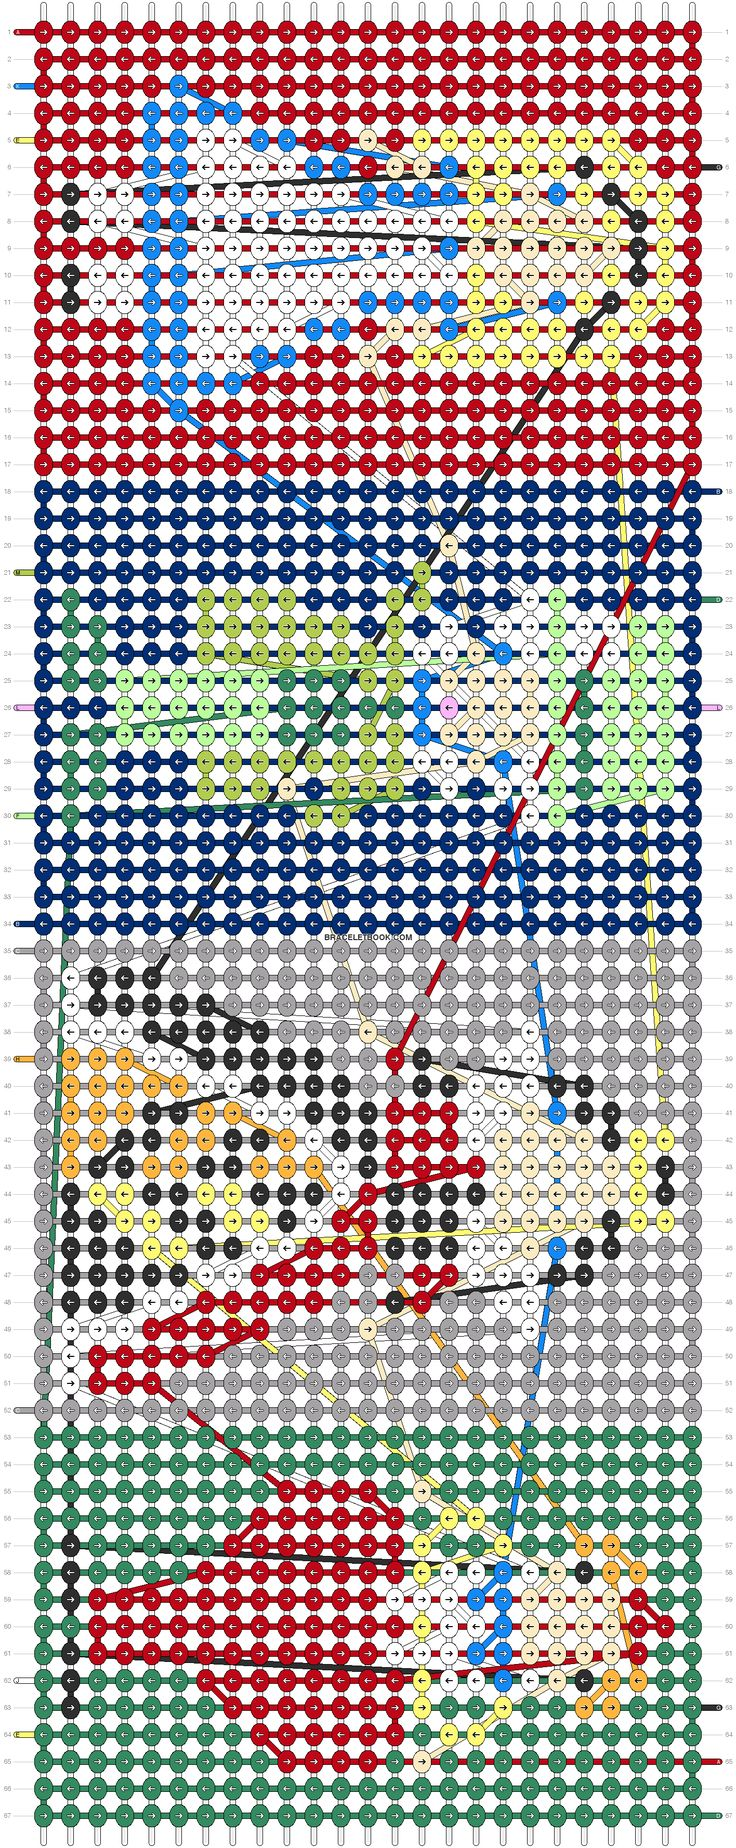 Alice In Wonderland Queen Friendship Bracelet Pattern Number 11588  For  More Patterns And Tutorials Visit